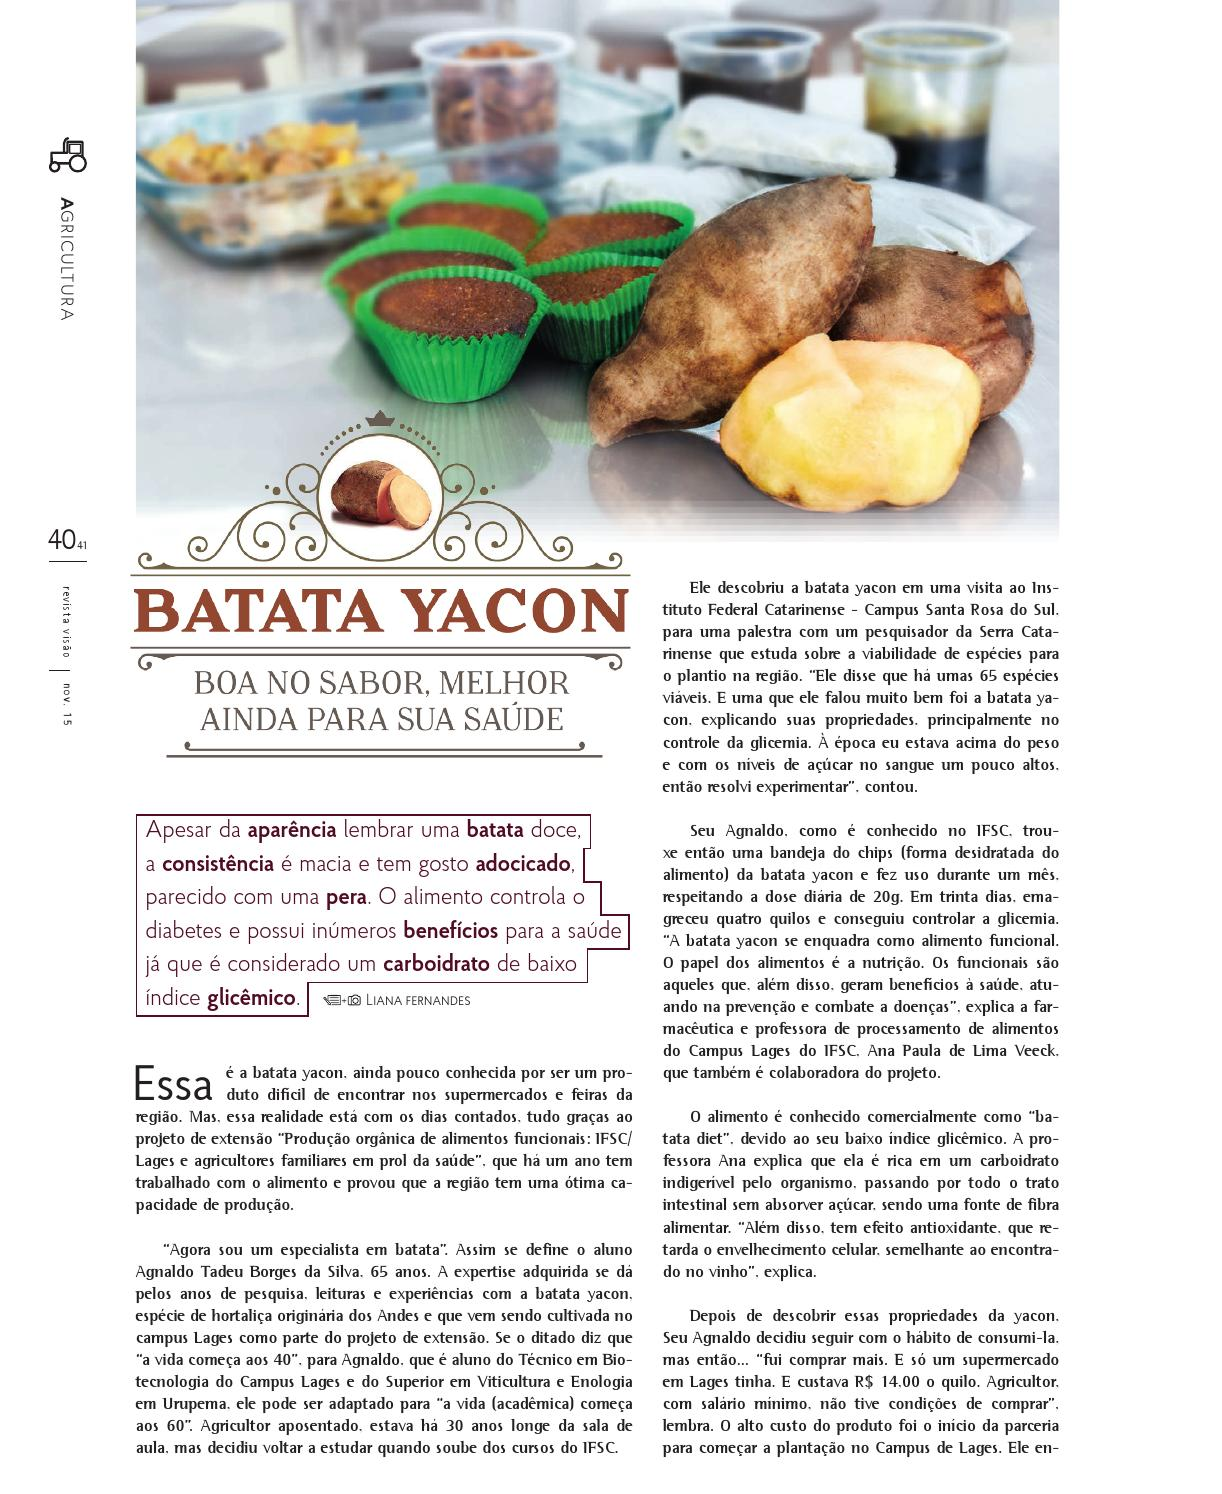 batata doce é alimento funcional